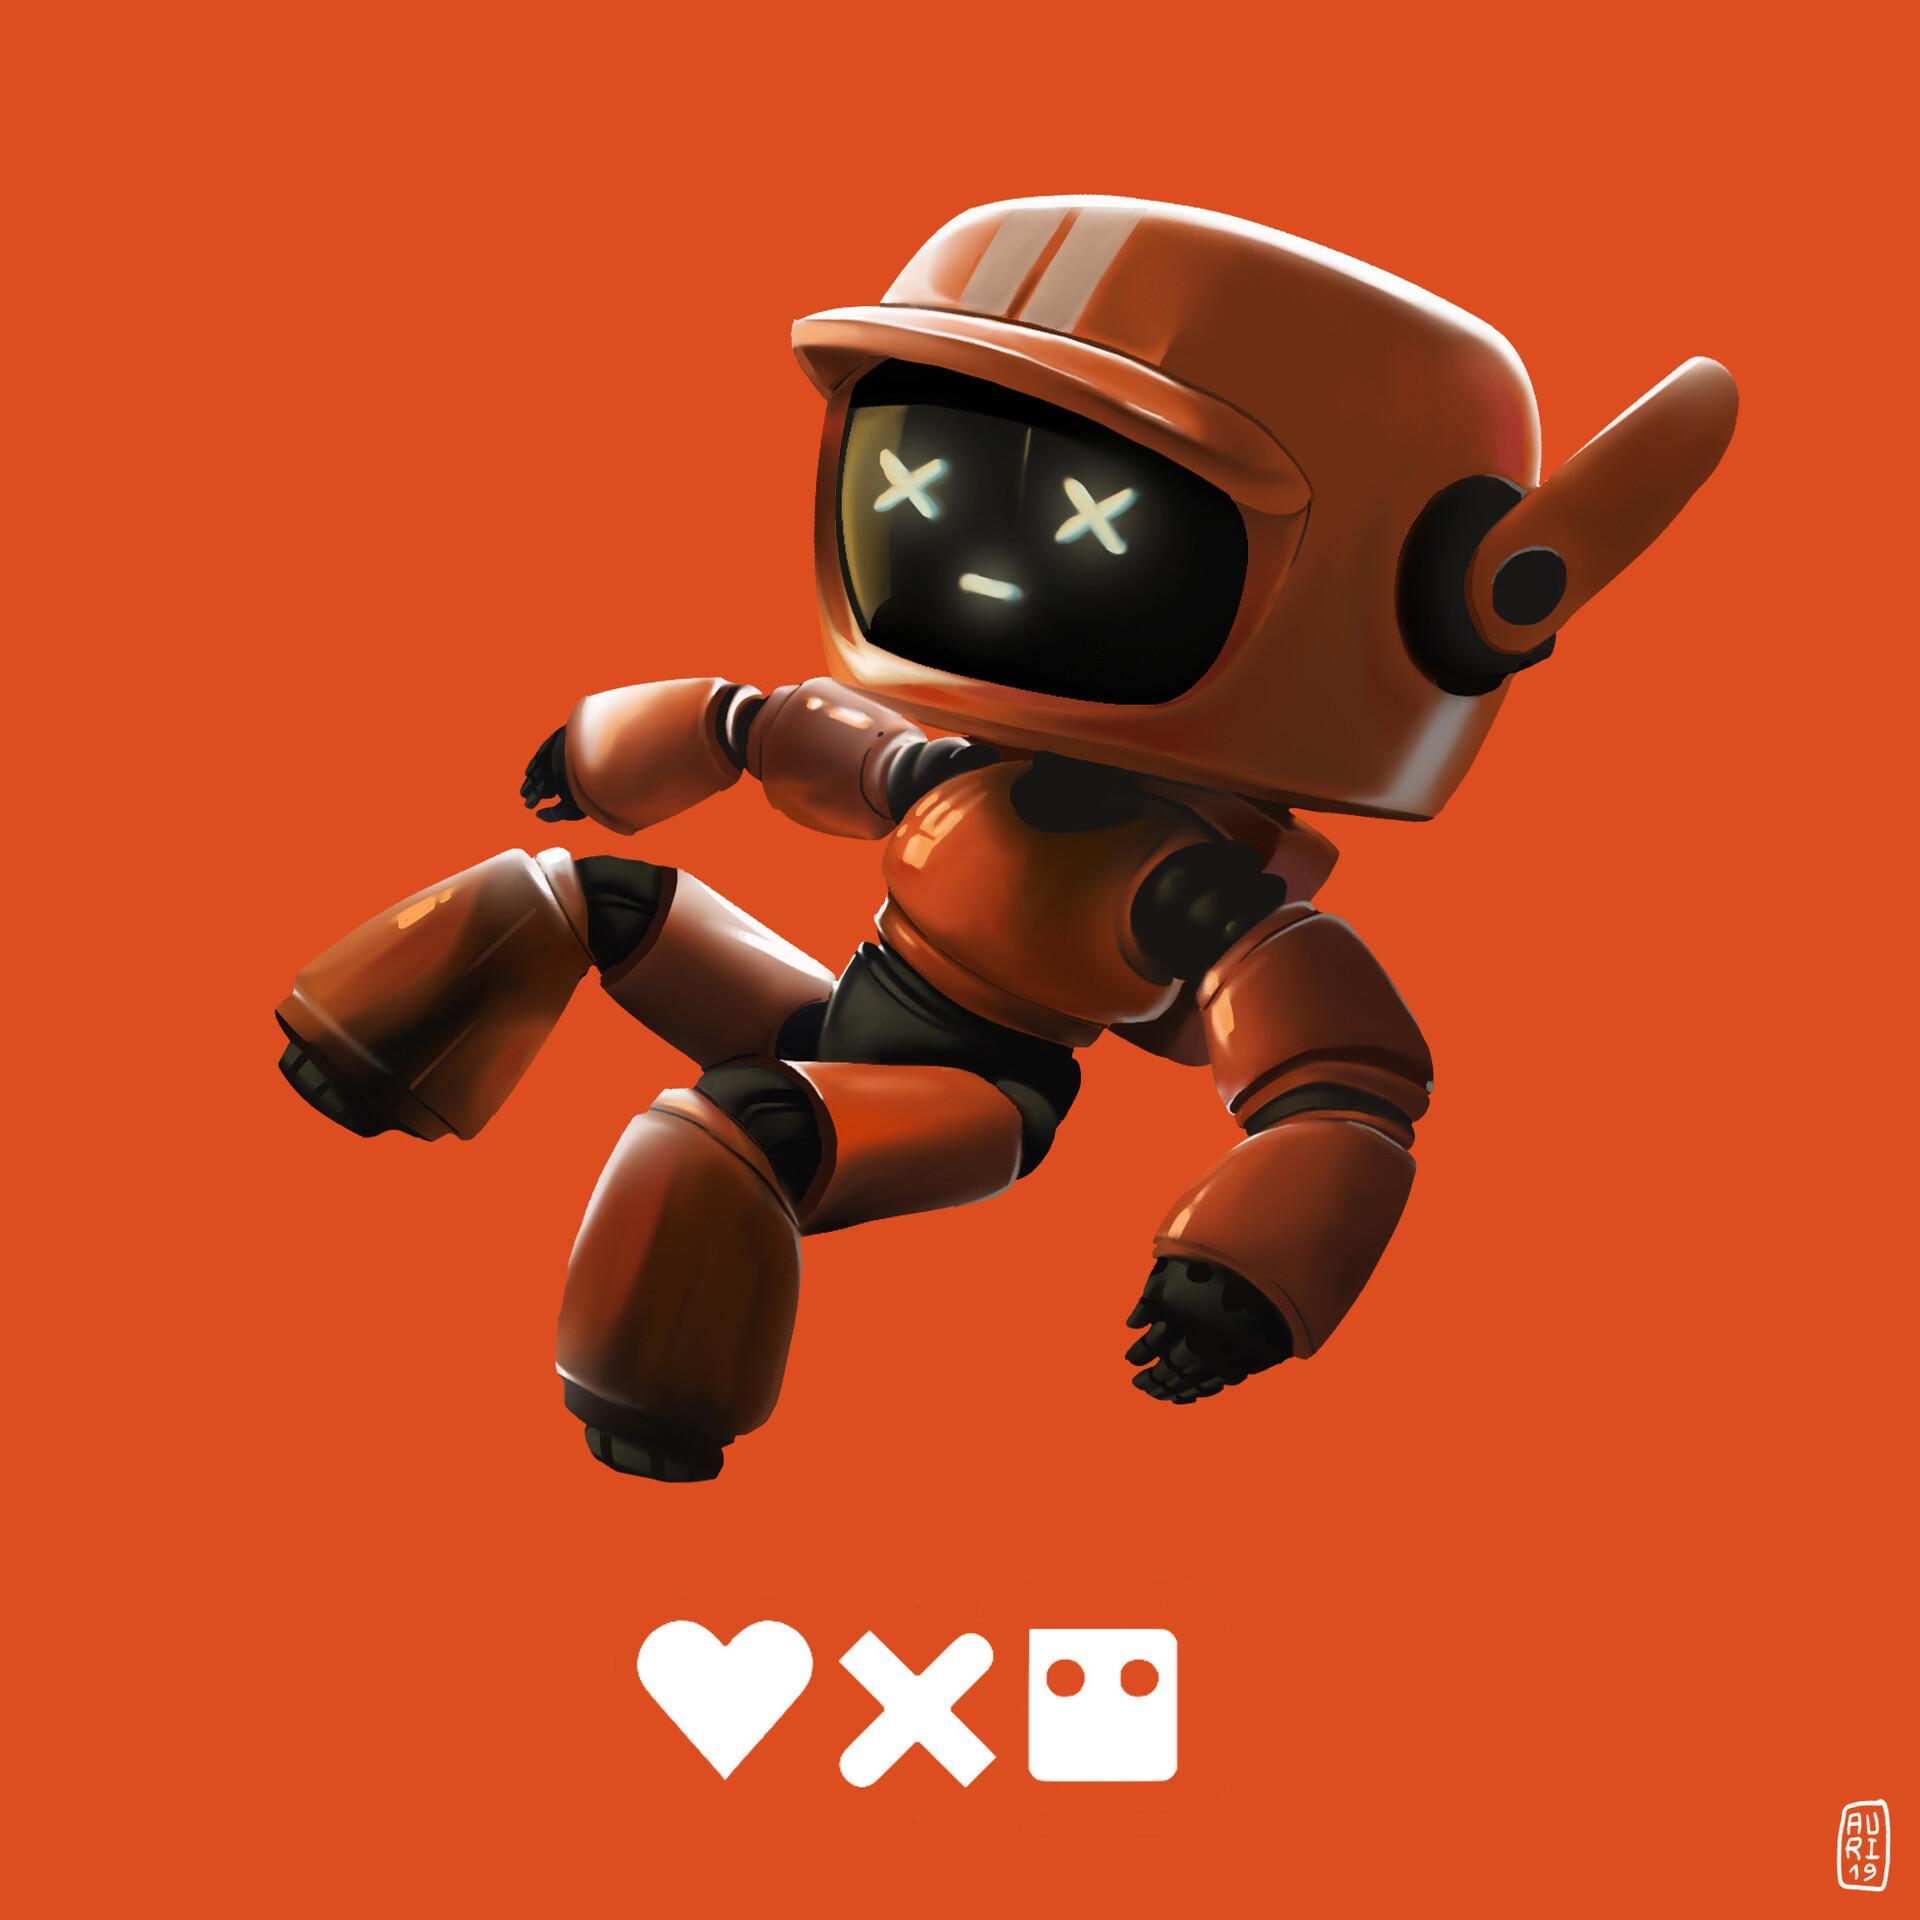 ArtStation - THREE ROBOTS fanart : LOVE, DEATH & ROBOTS ...